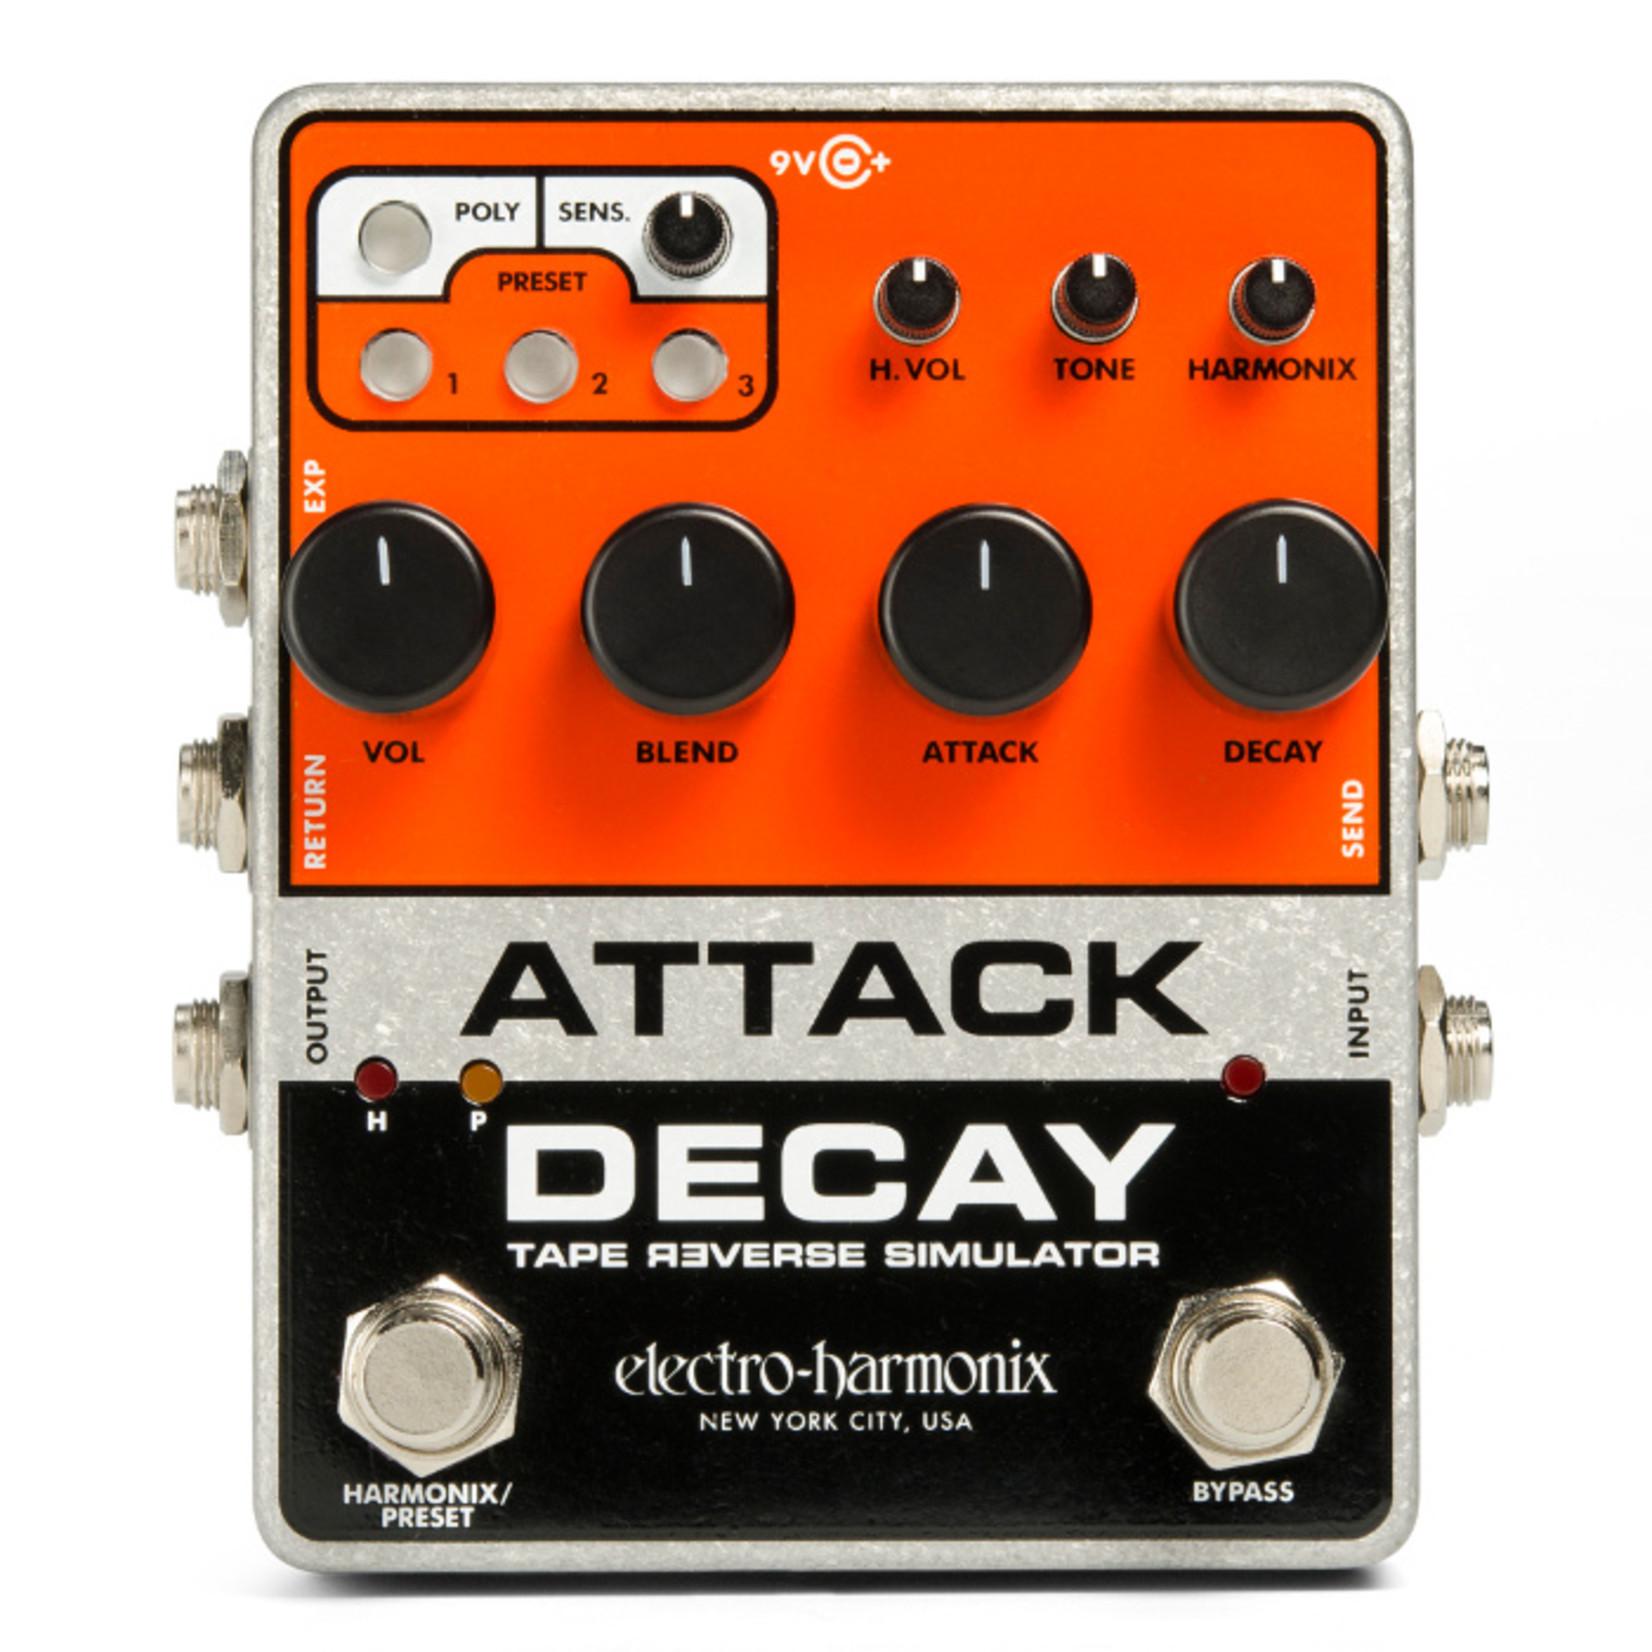 Electro Harmonix Electro Harmonix Attack Decay Tape Reverse Simulator